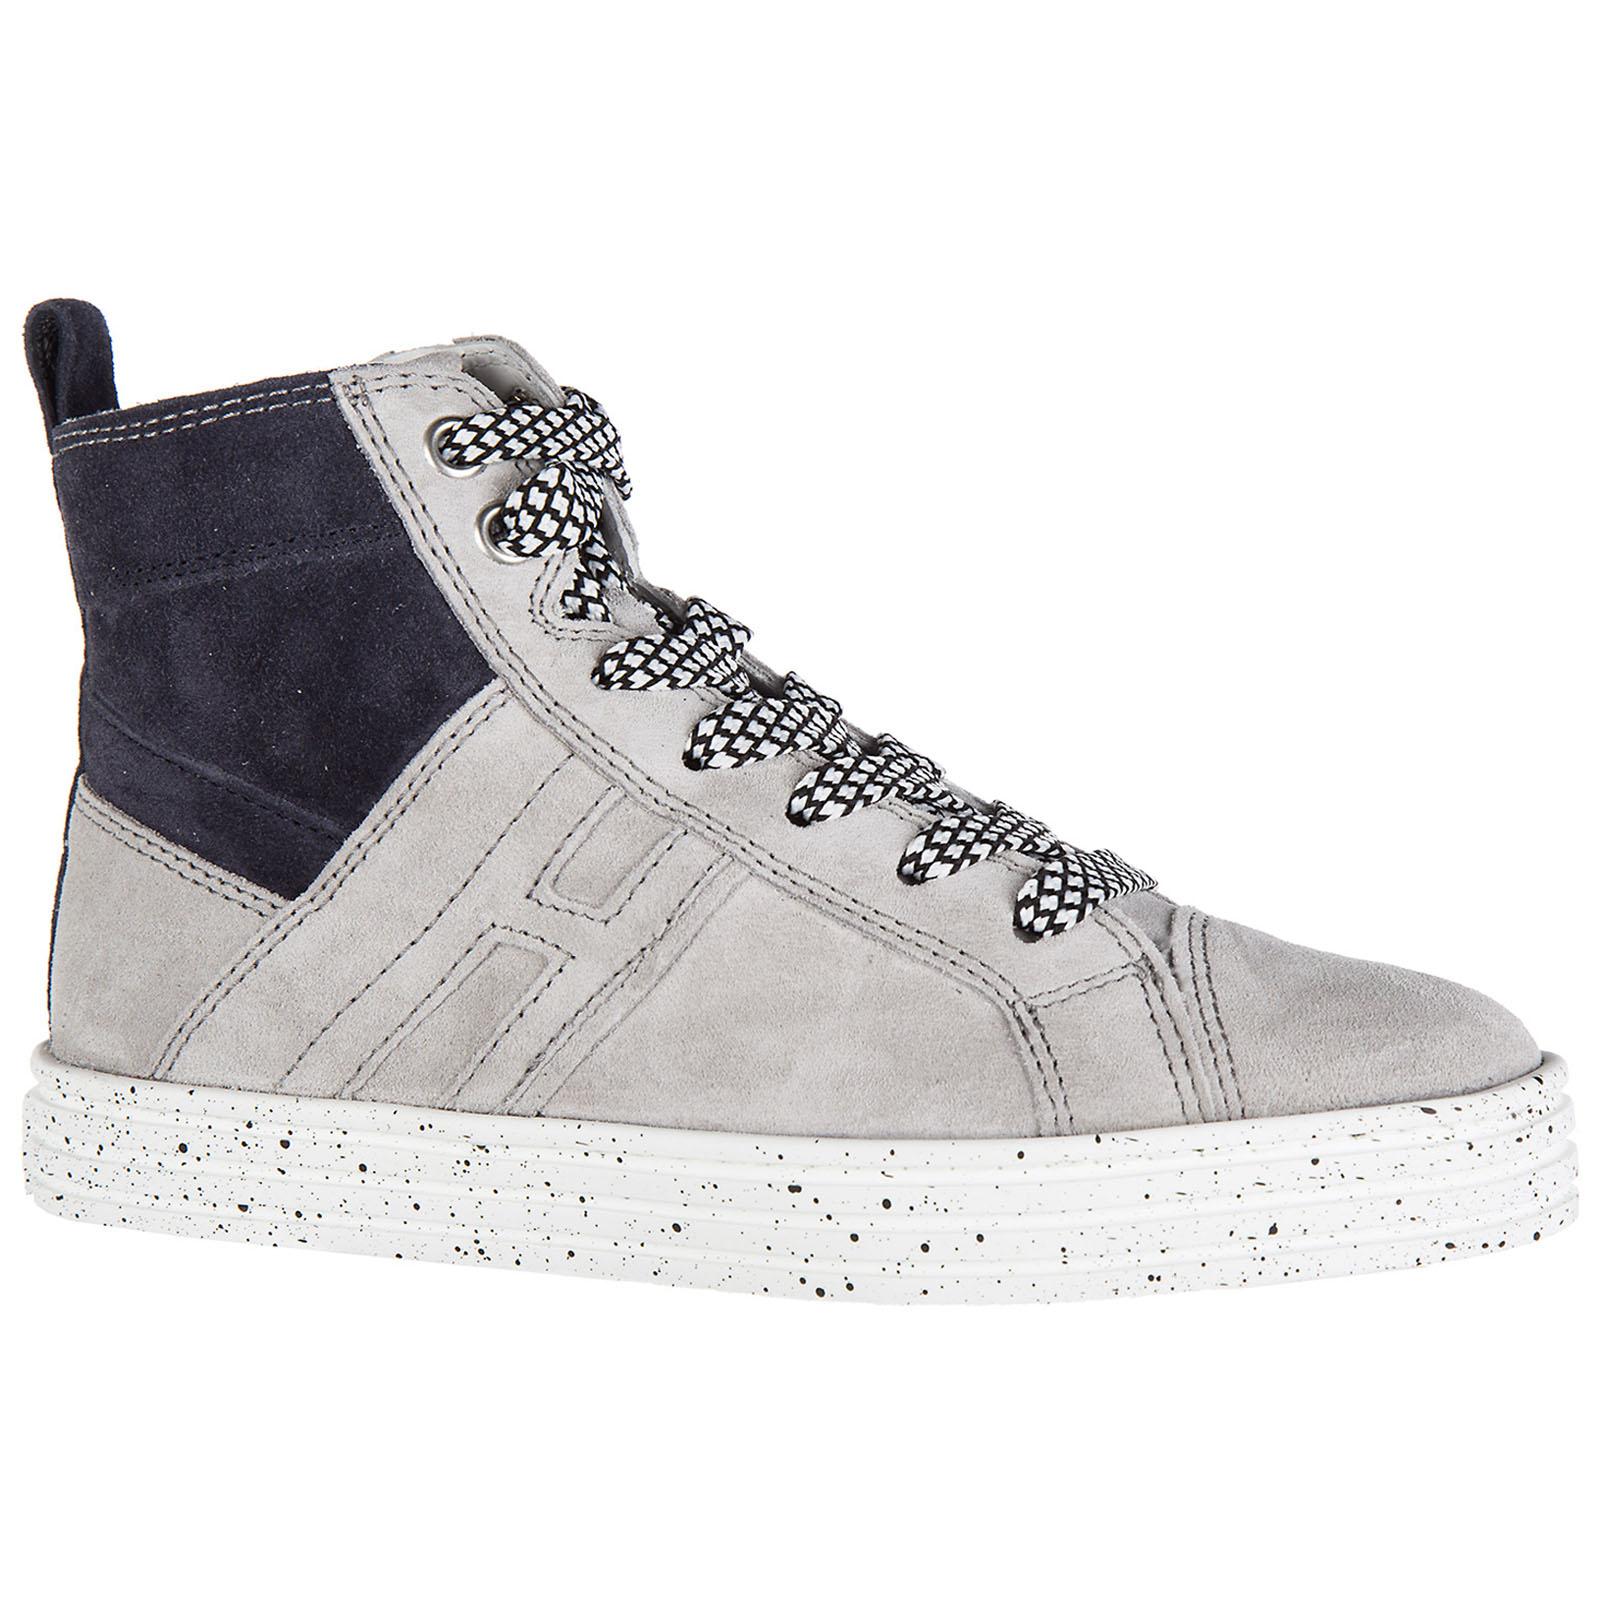 c1588ecab74c6 ... Chaussures baskets sneakers enfant garçon alte camoscio r141 mid cut  zip ...